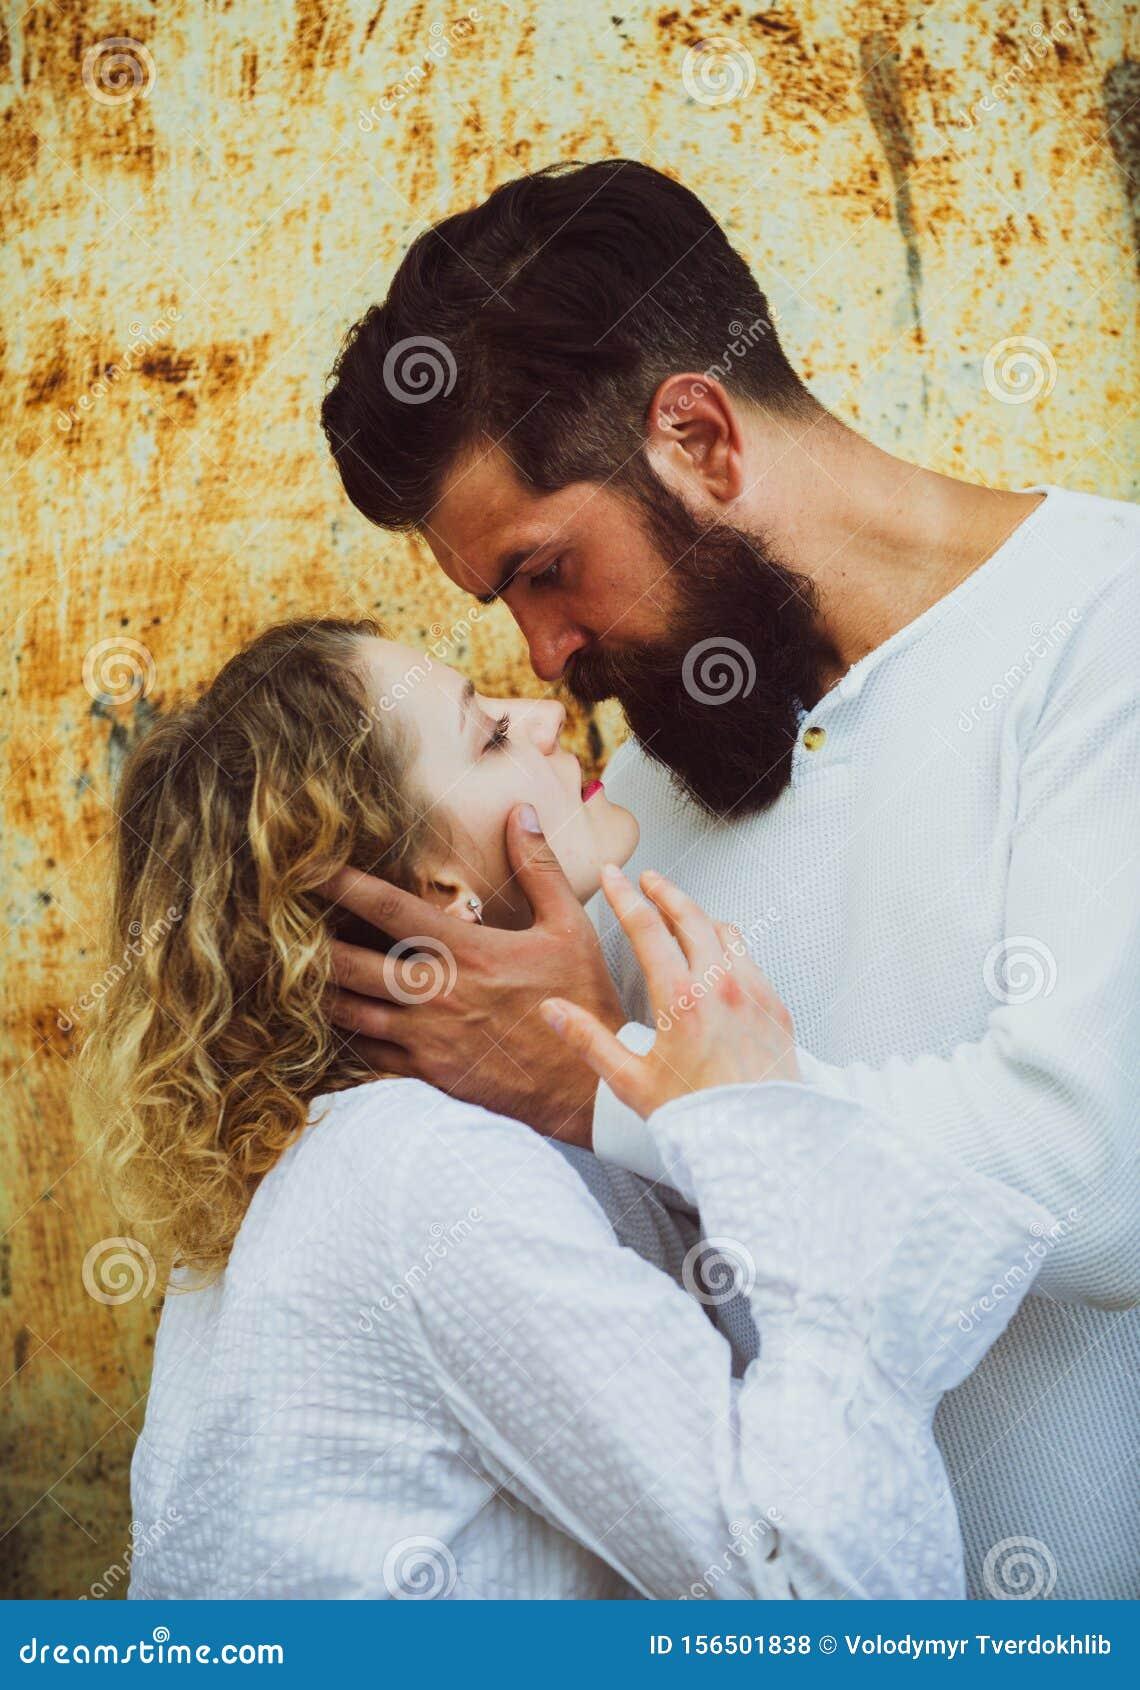 Husband wife sex pleasure